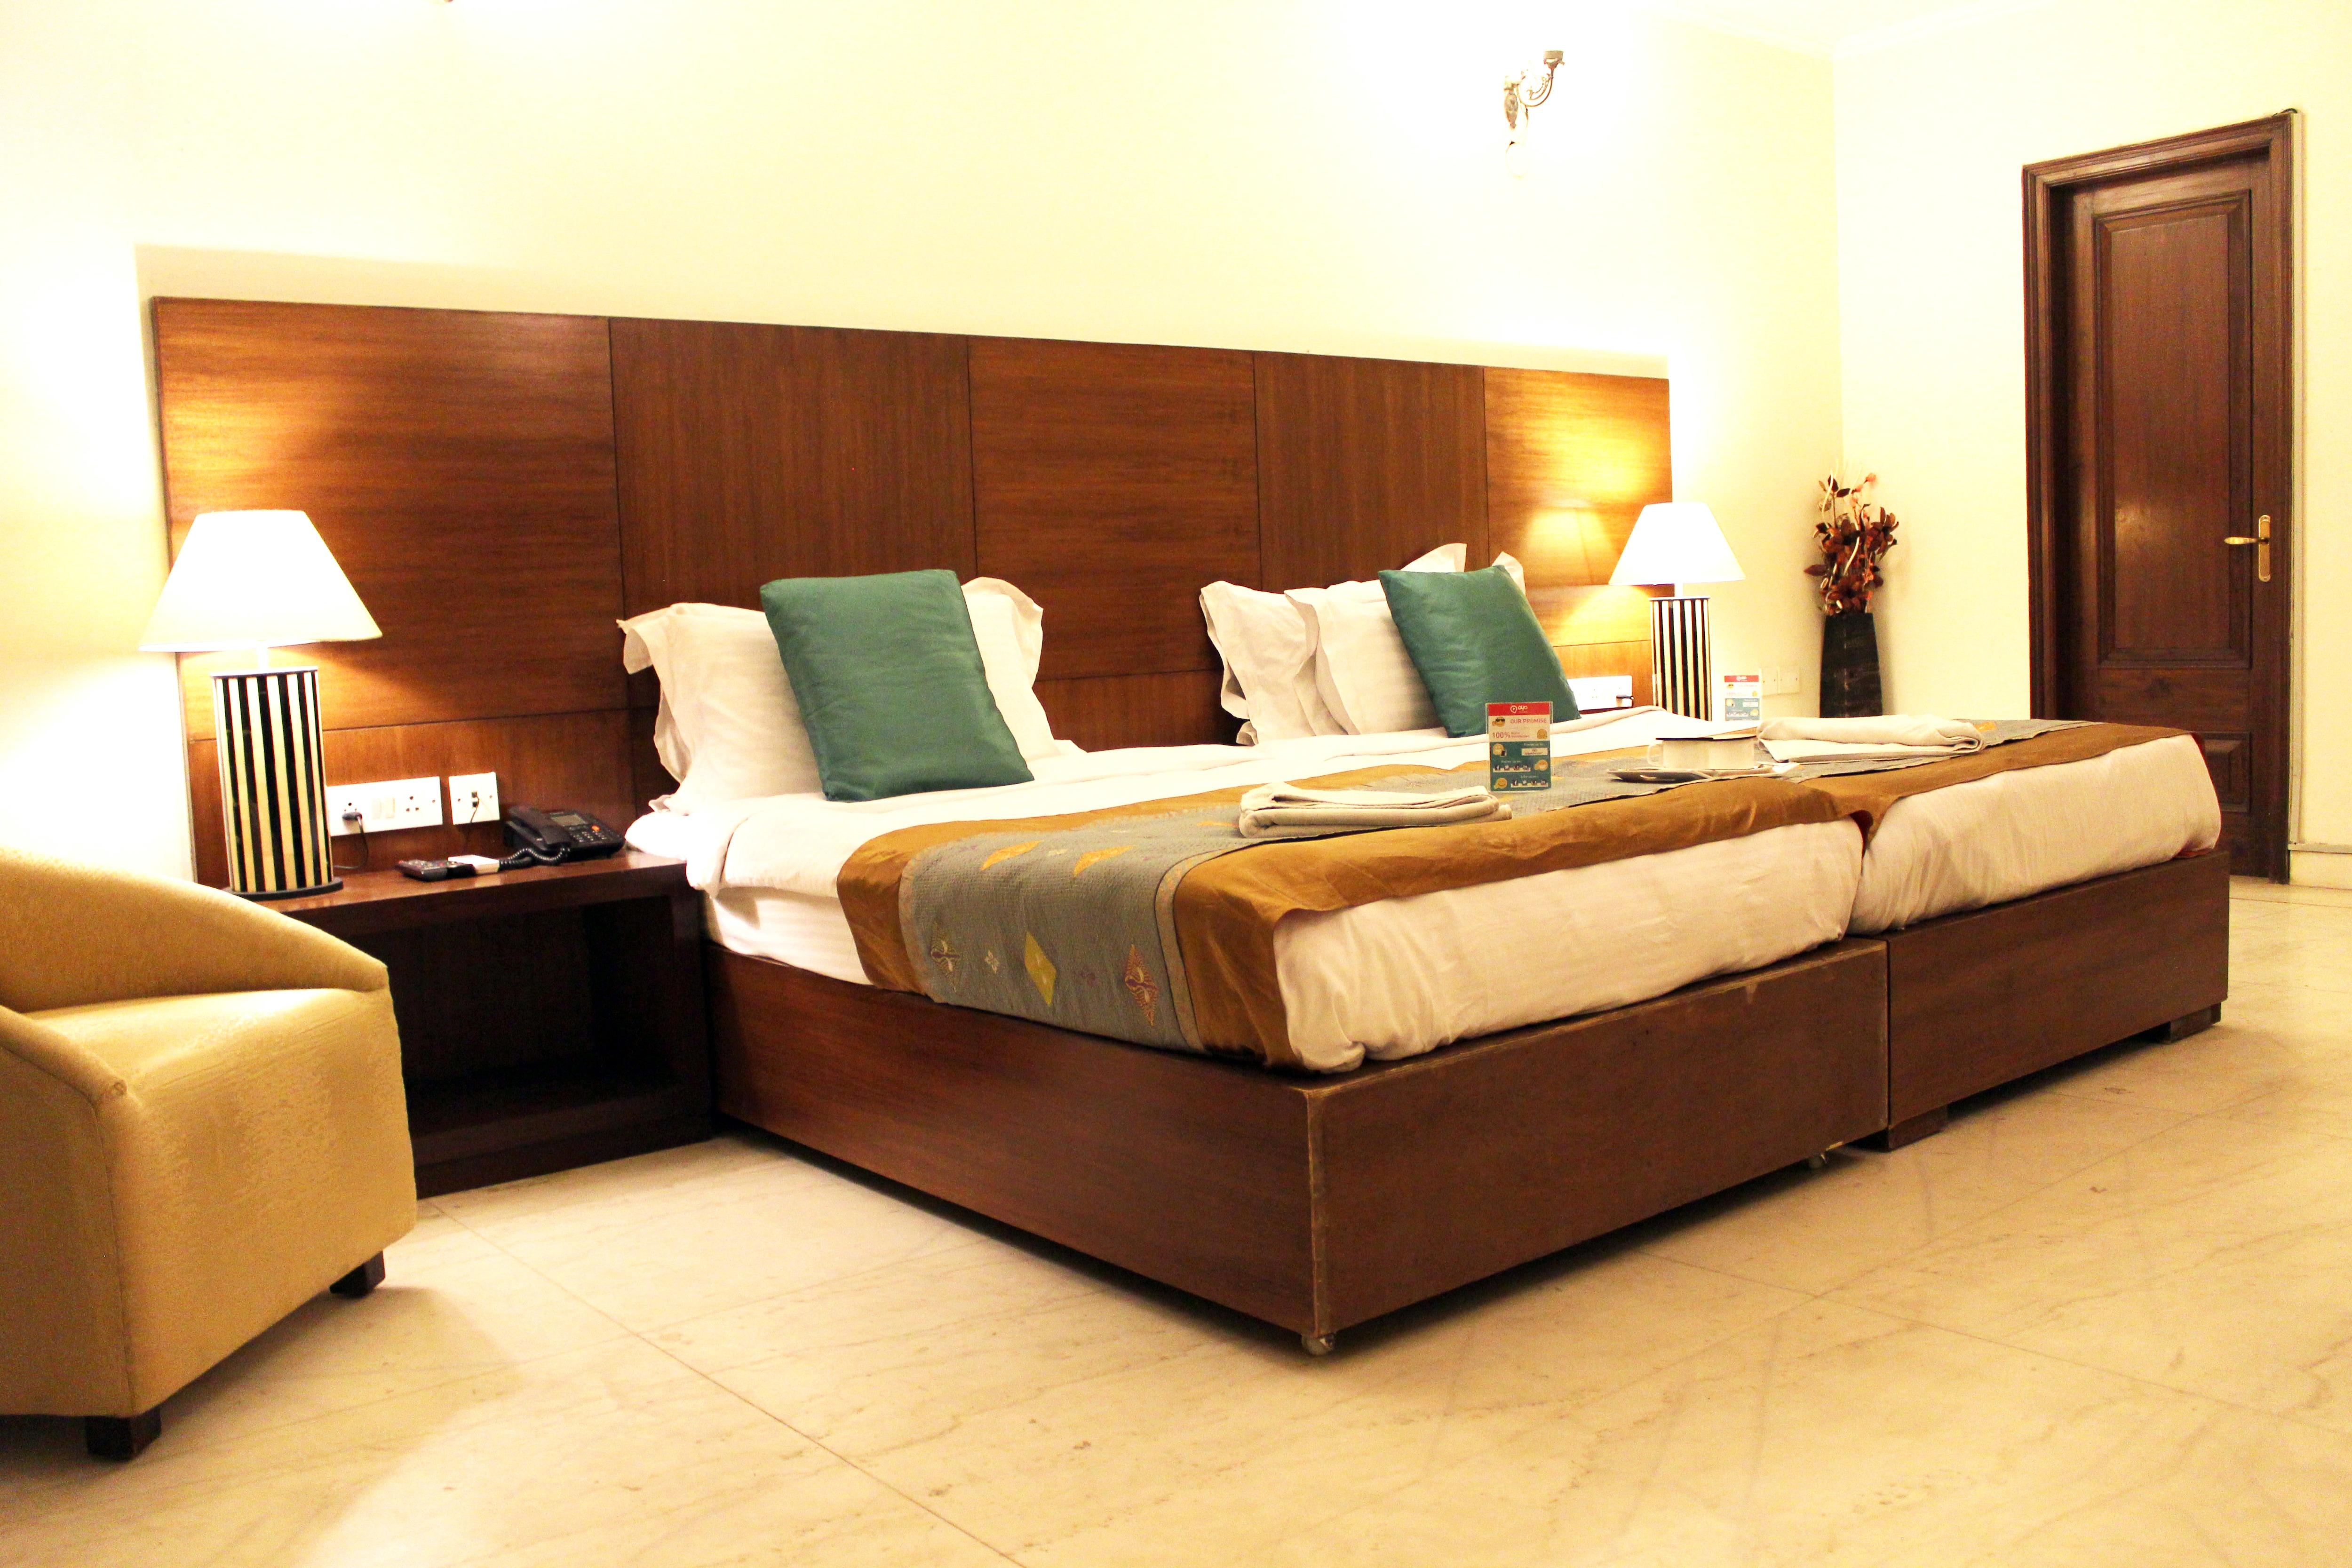 Oyo 610 Hotel Residence Phase 3 in Gurugram